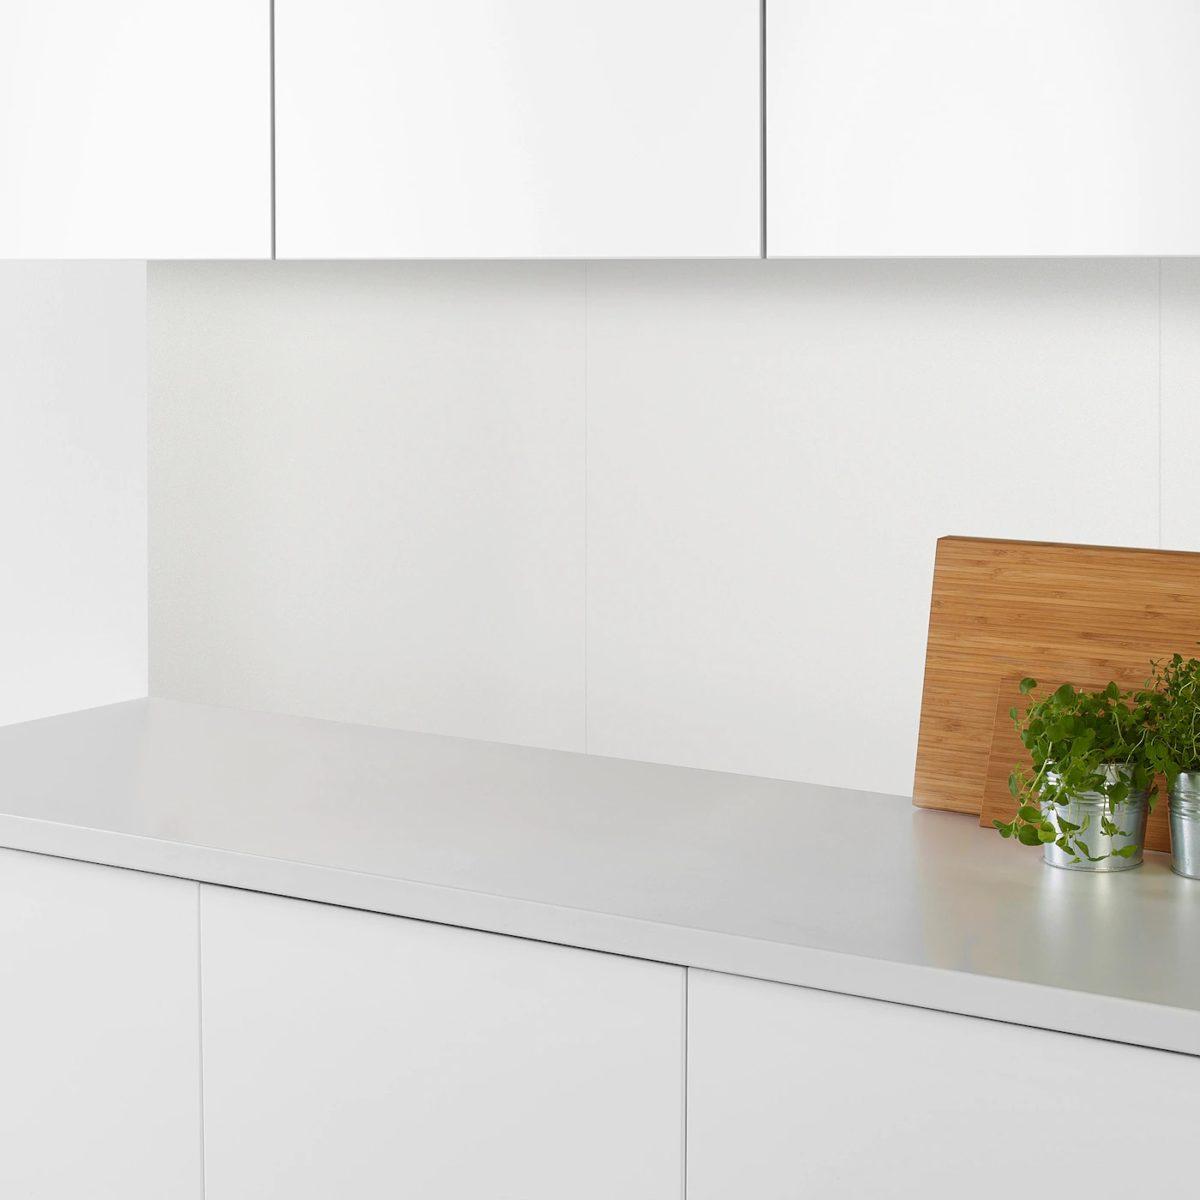 cucina-ikea-primavera-rivestimento-parete